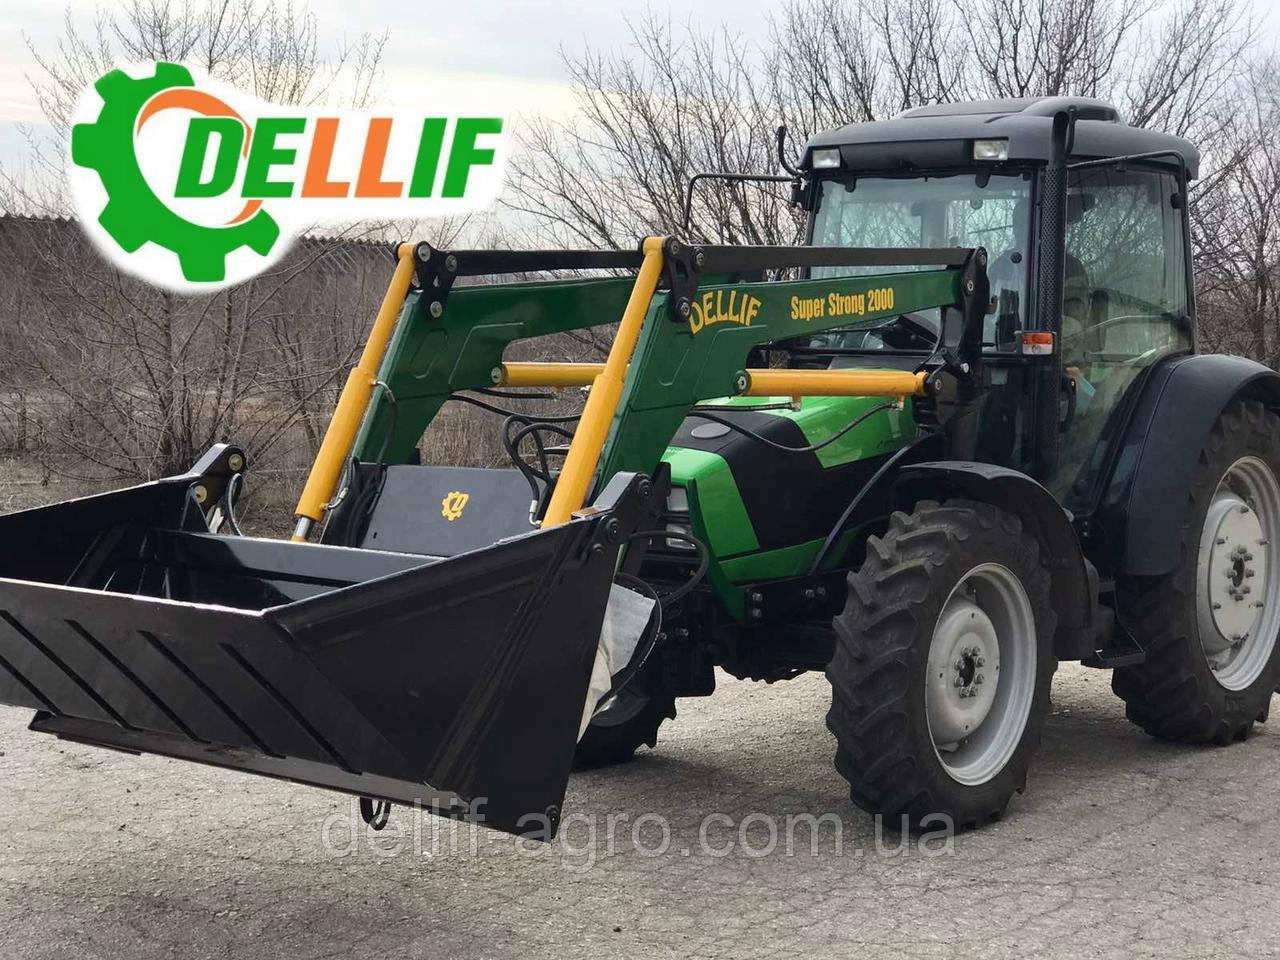 Кун на трактор МТЗ 1221 - Деллиф Супер Стронг 2000